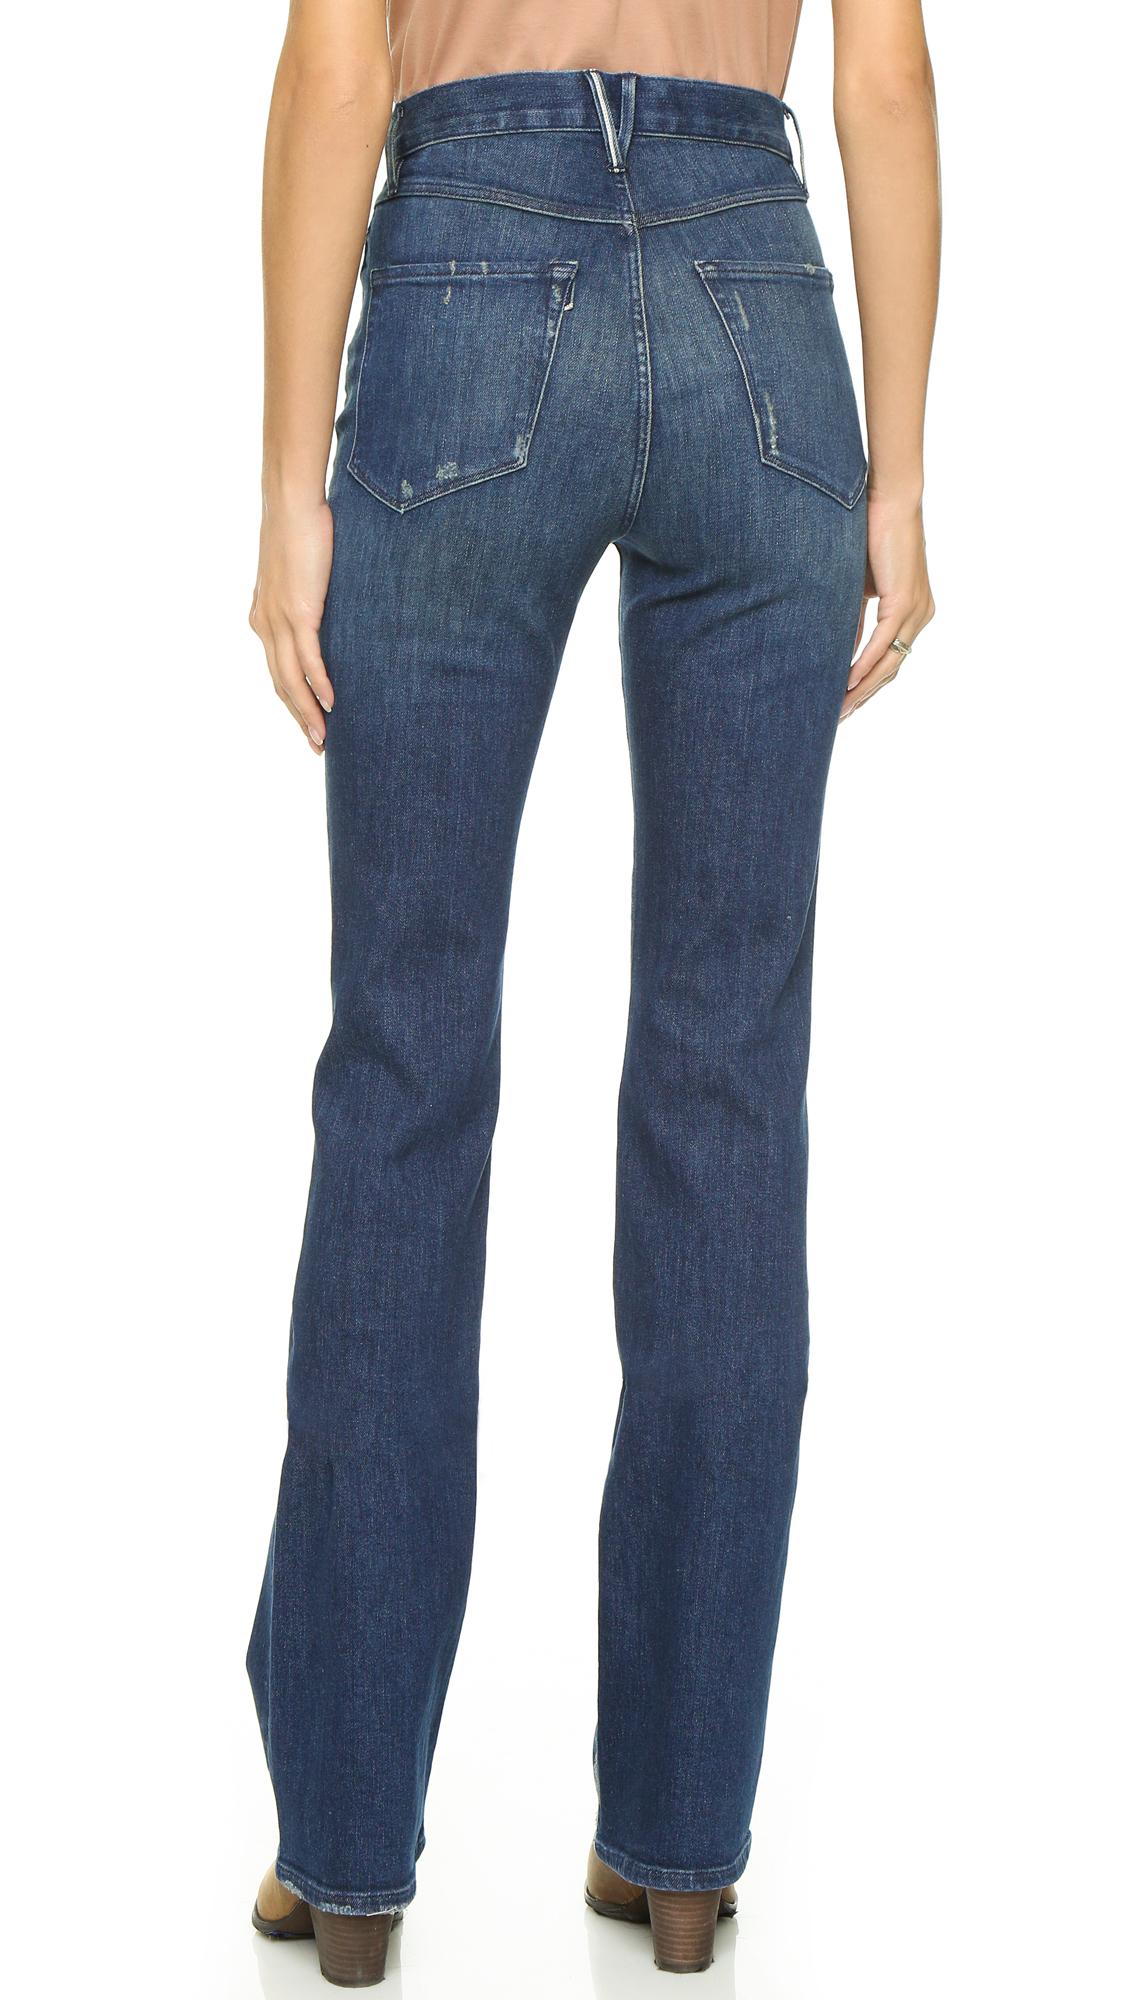 high-rise flared jeans - Blue 3x1 5CMPy